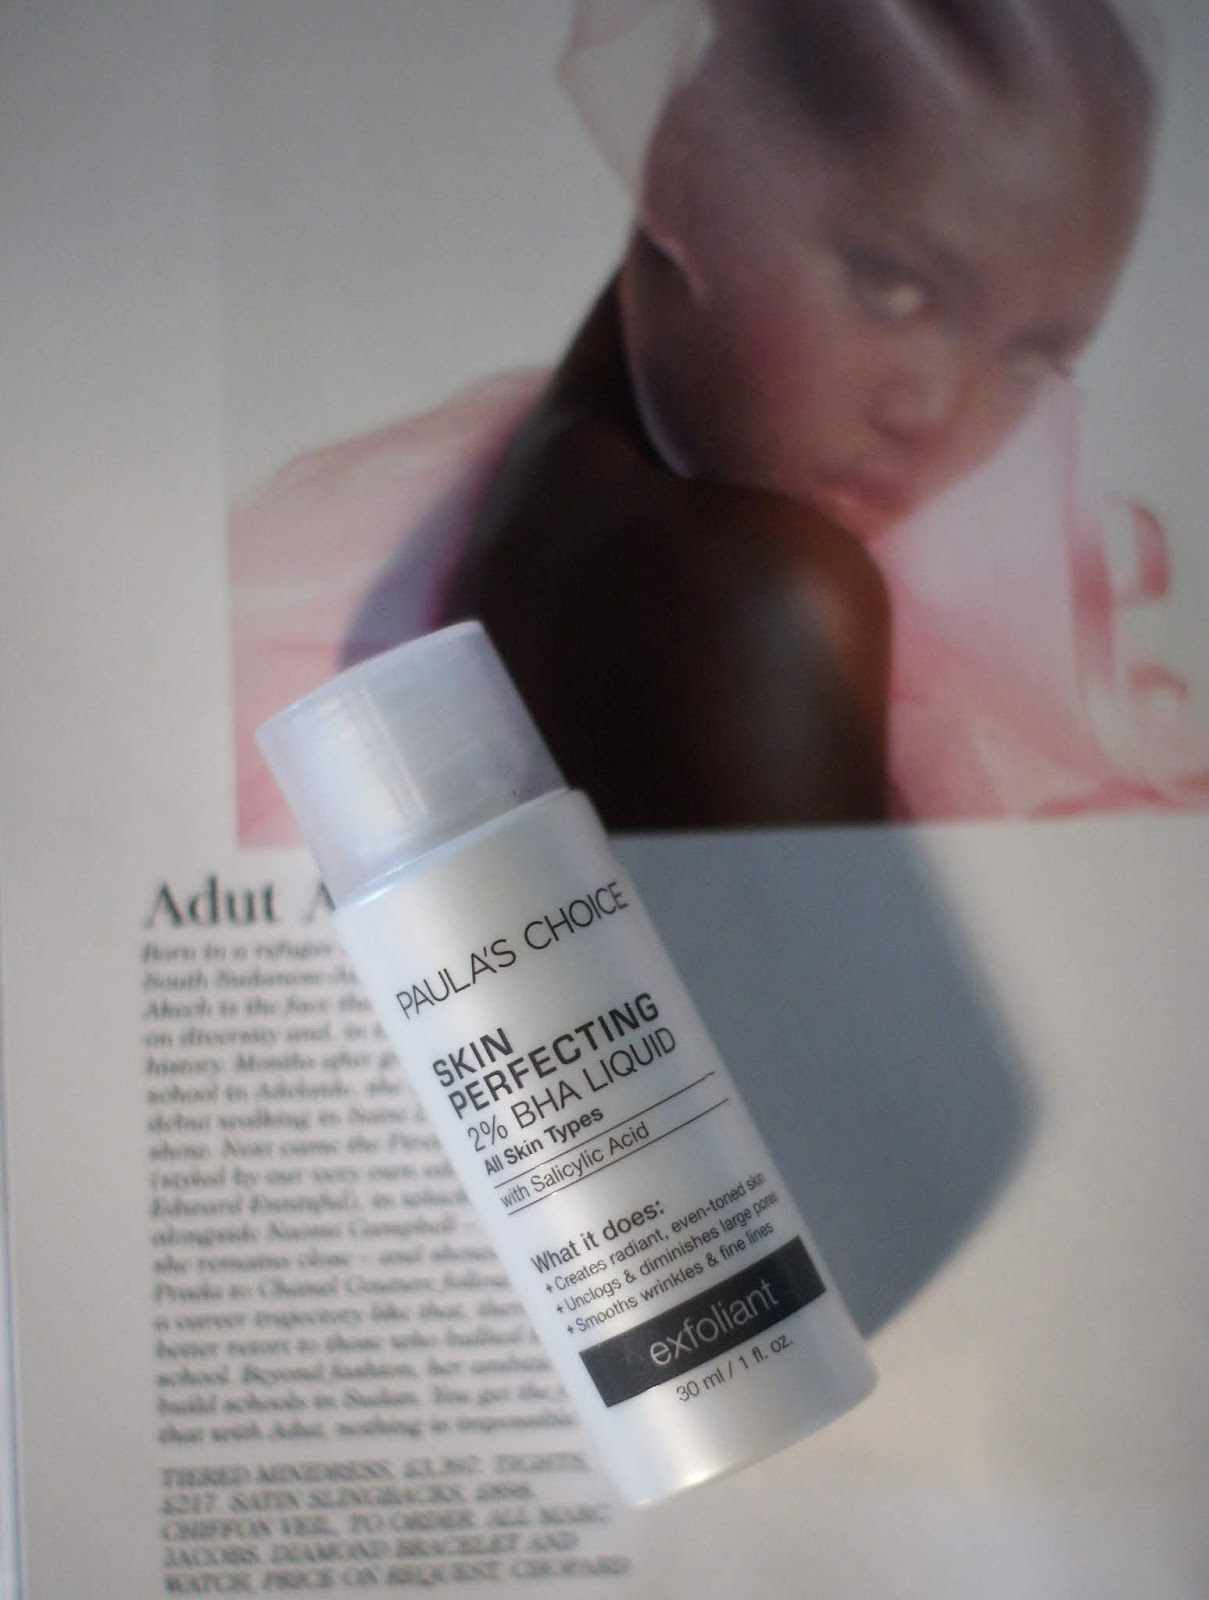 Święty Graal na trądzik. Skin Perfecting 2% Liquid/ Paula's Choice.